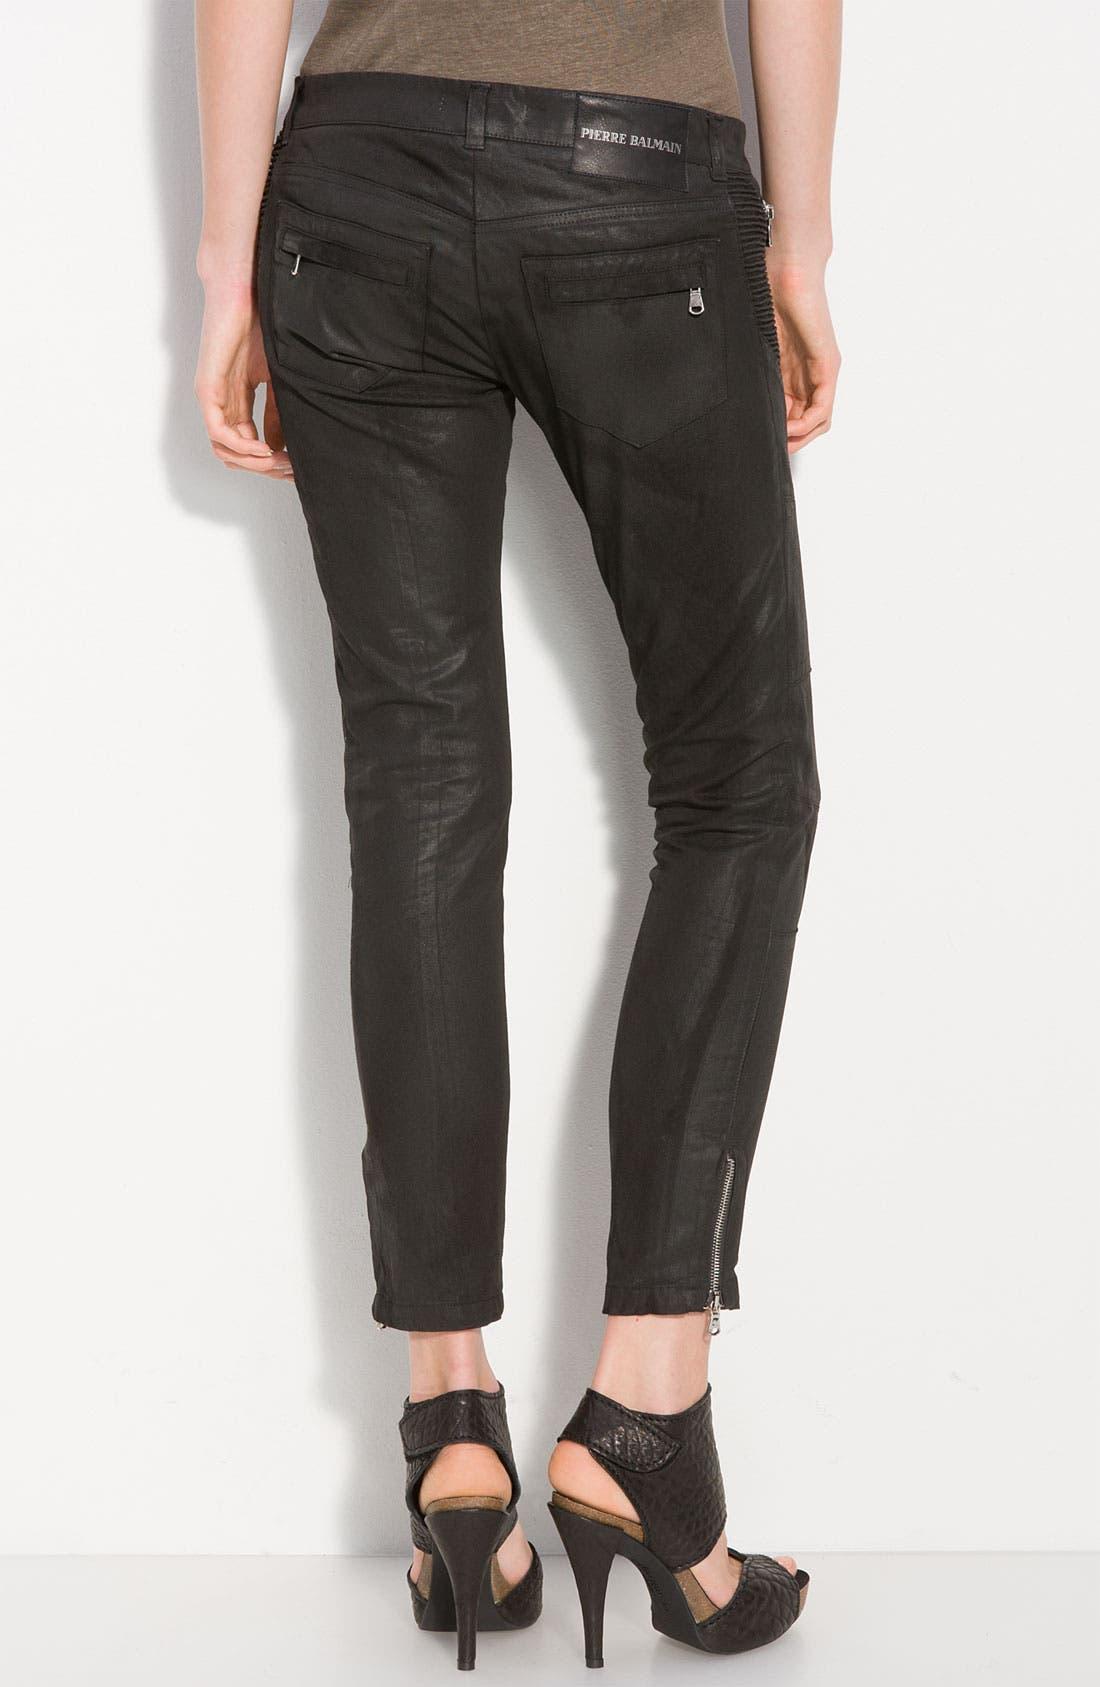 PIERRE BALMAIN, Waxed Cotton Stretch Pants, Main thumbnail 1, color, 001